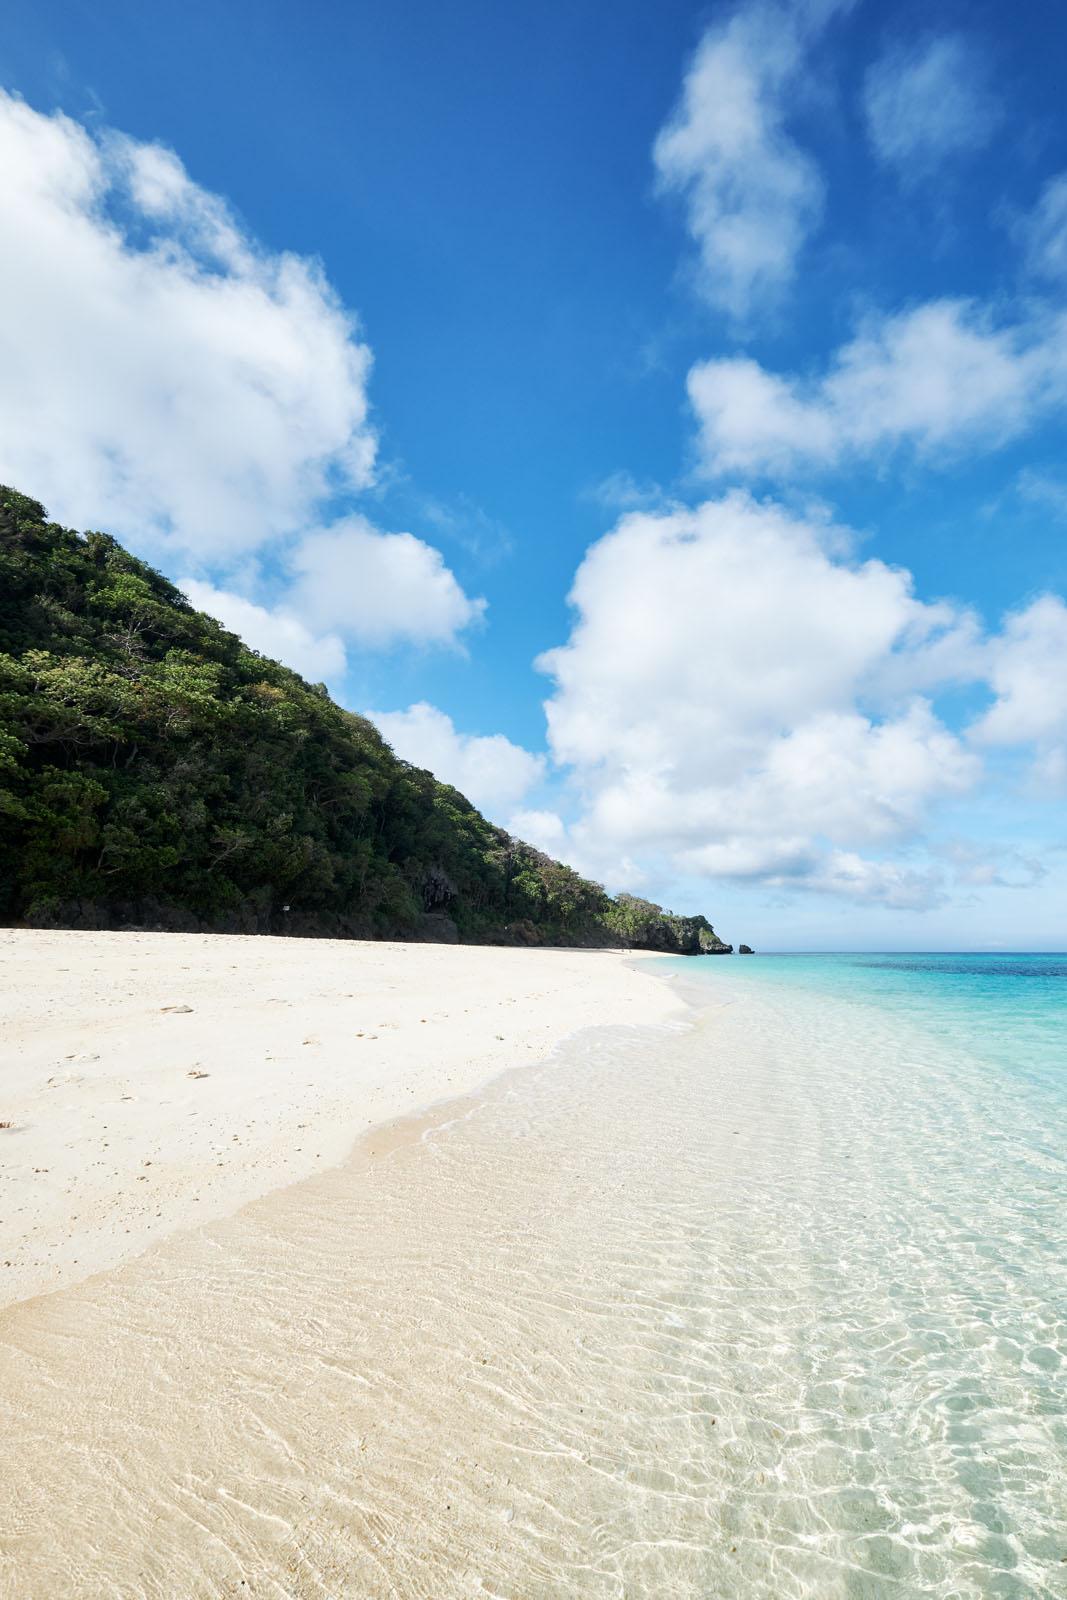 the far end of Puka Shell Beach